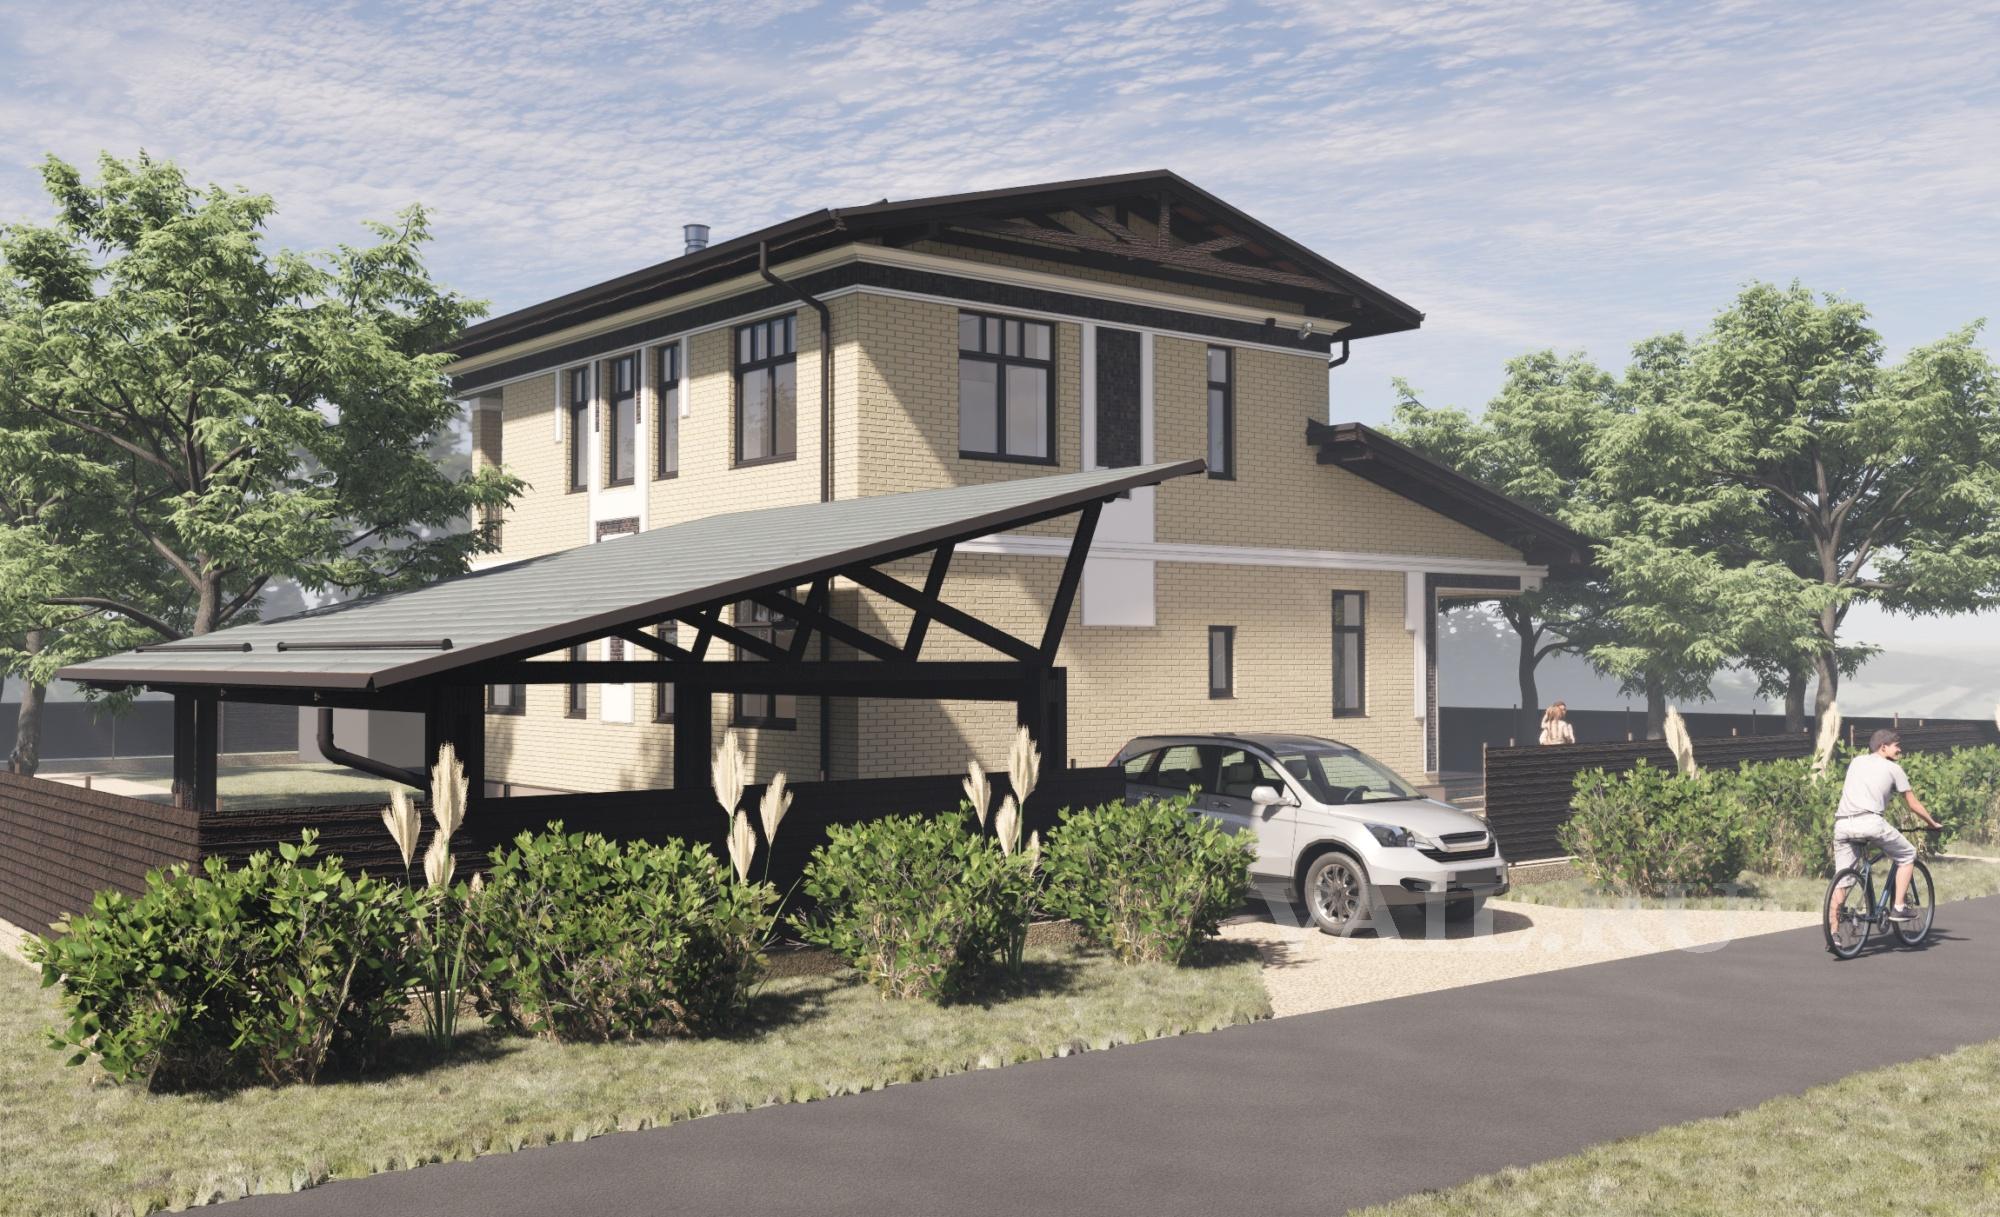 Дом в Сатино. Вид от гаража.